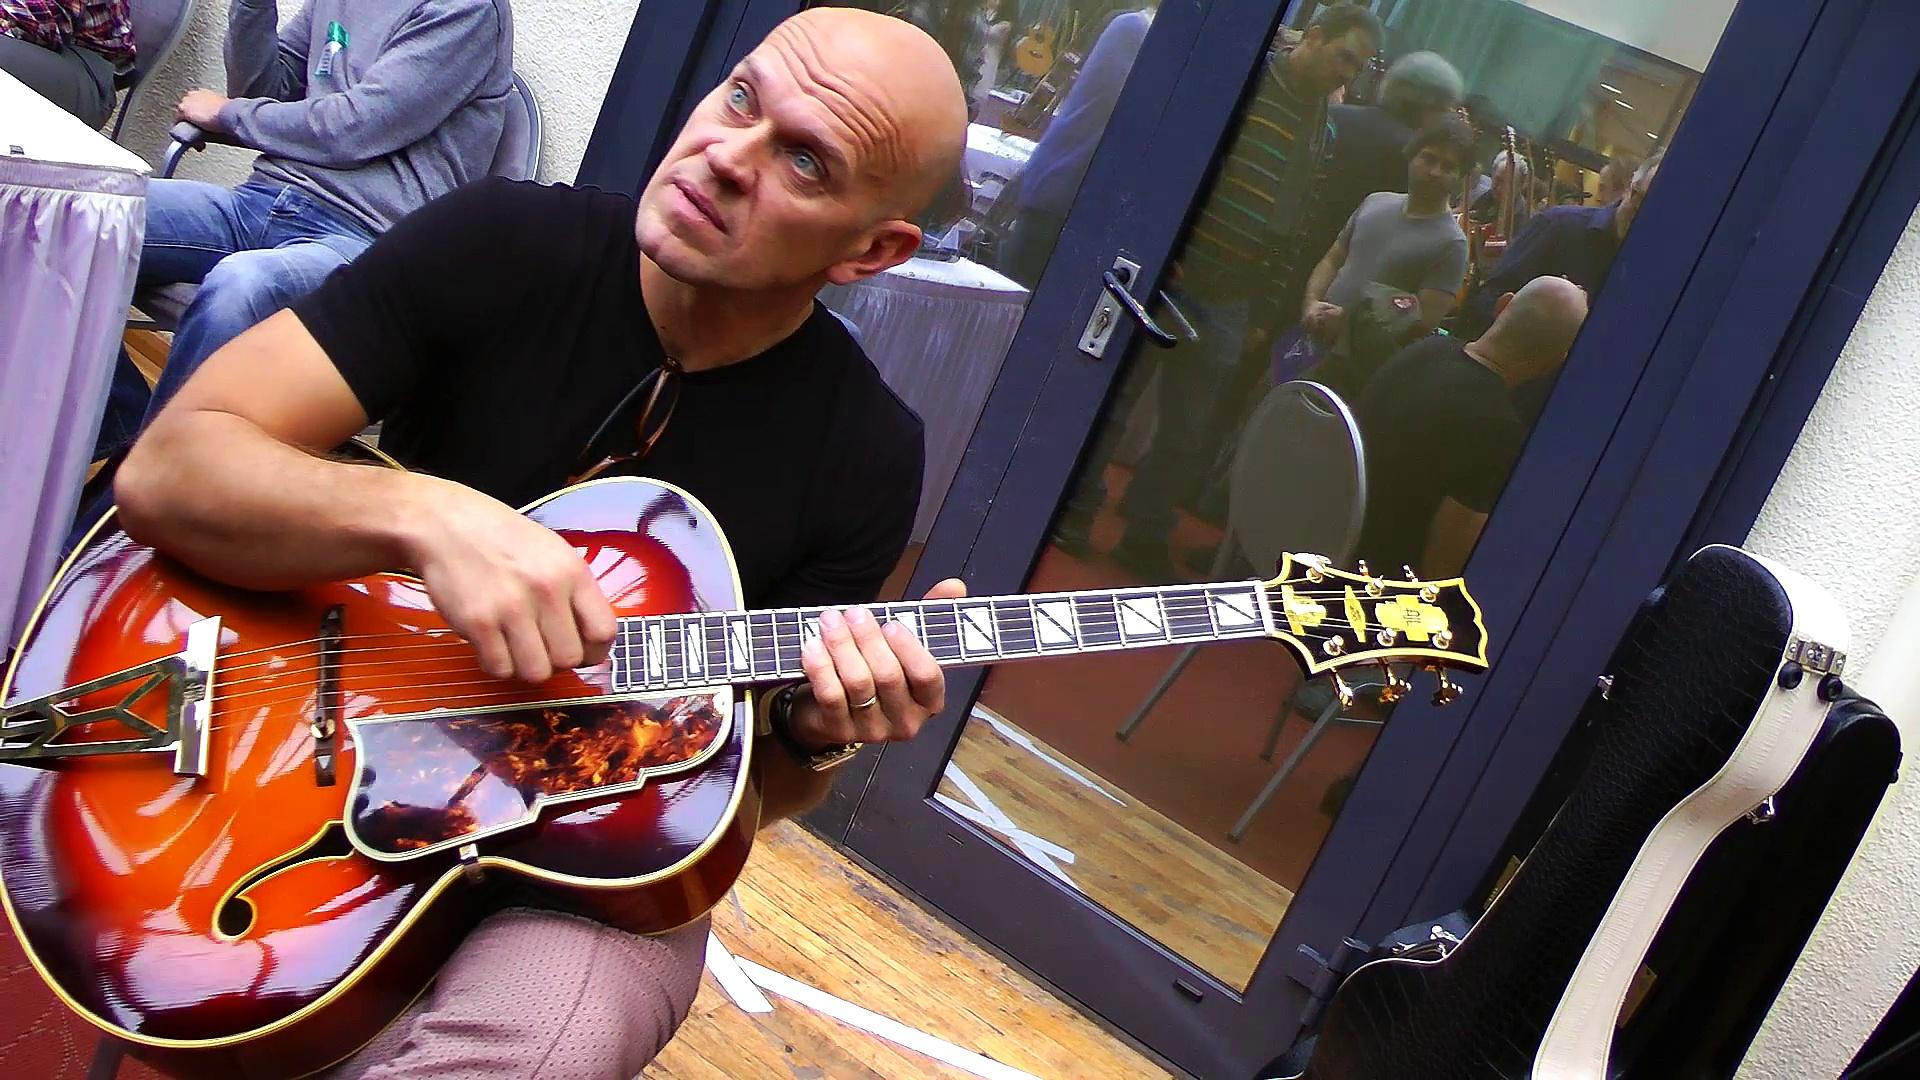 The Holy Grail Guitar Show 2014 – AJL Guitars